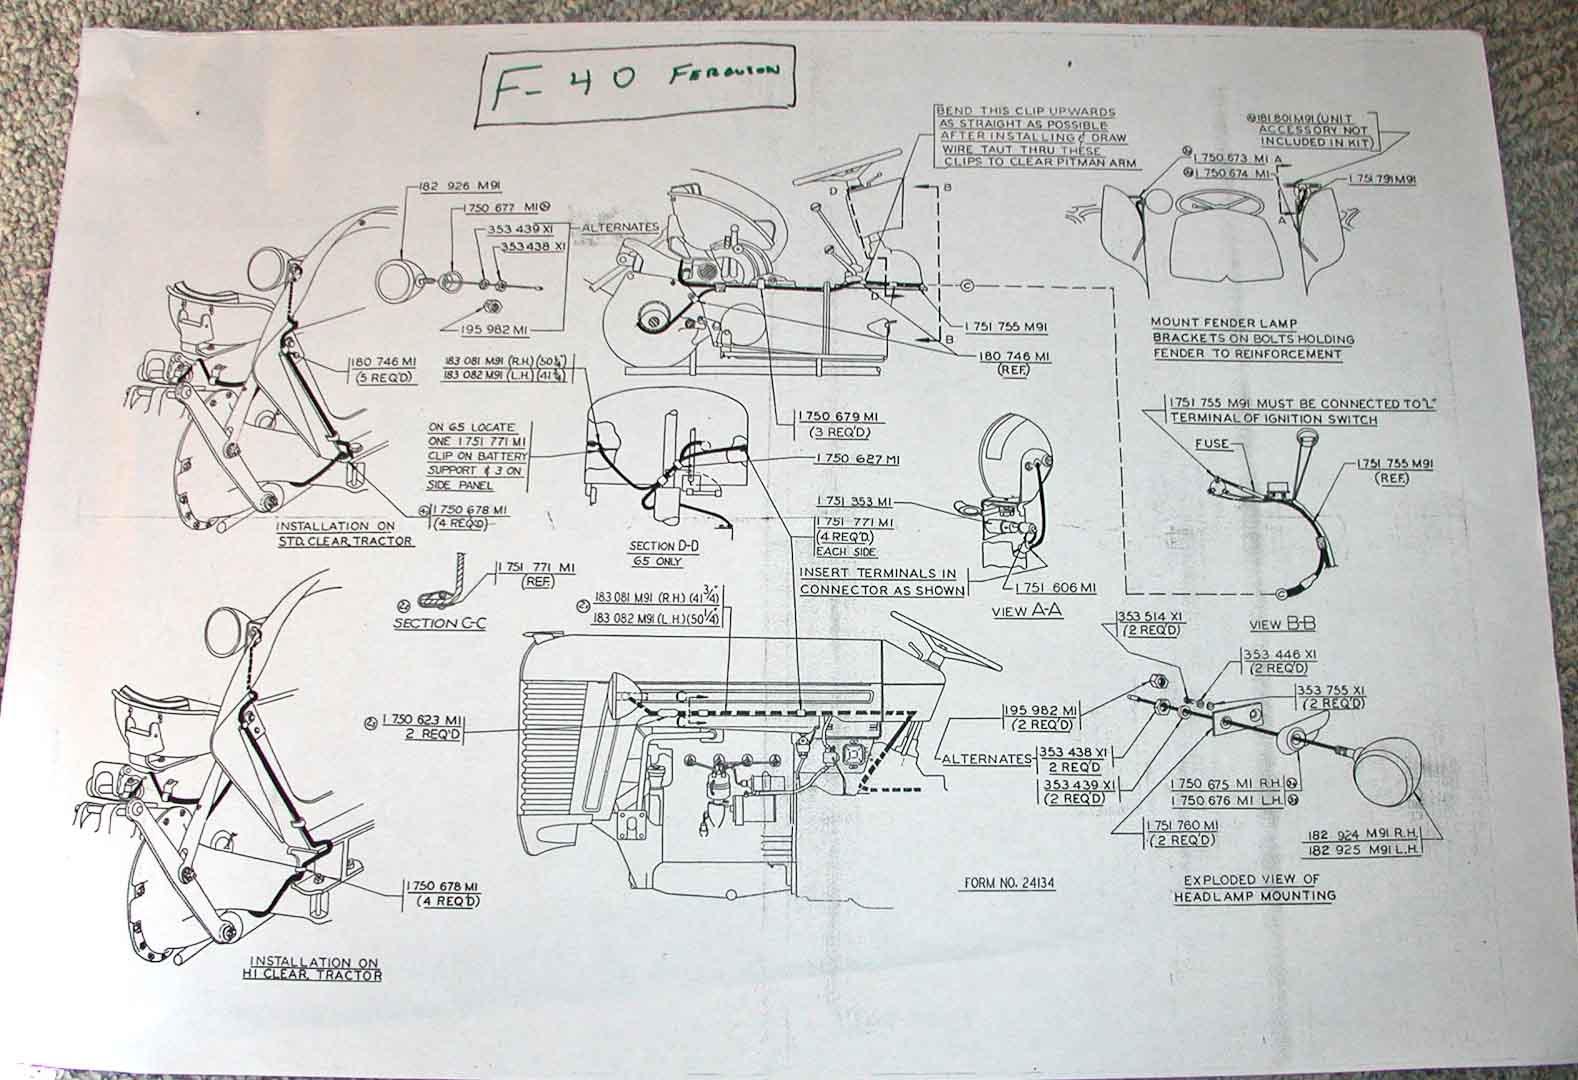 12 Volt Wiring Diagram To20 Ferguson Tractor